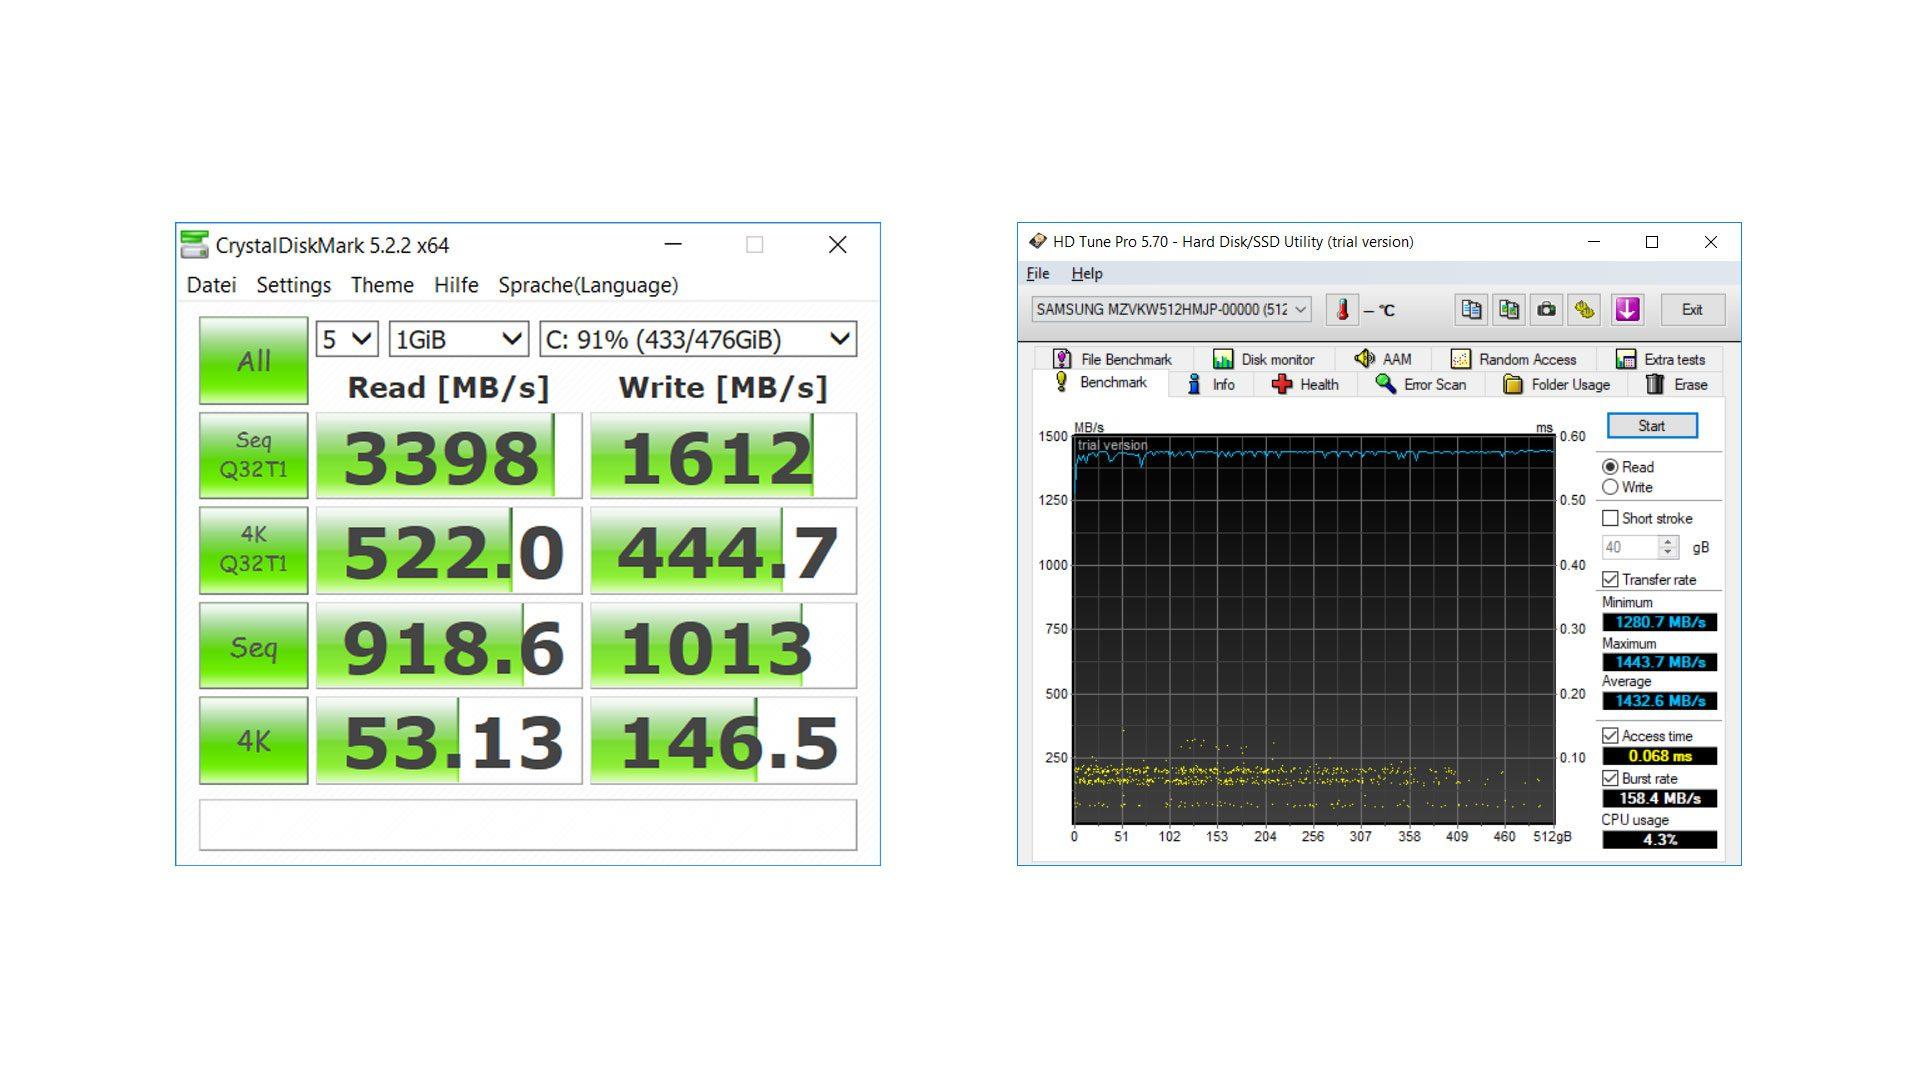 Asus-ROG-Zephyrus-GX501VI-GZ020T_Benchmark-6